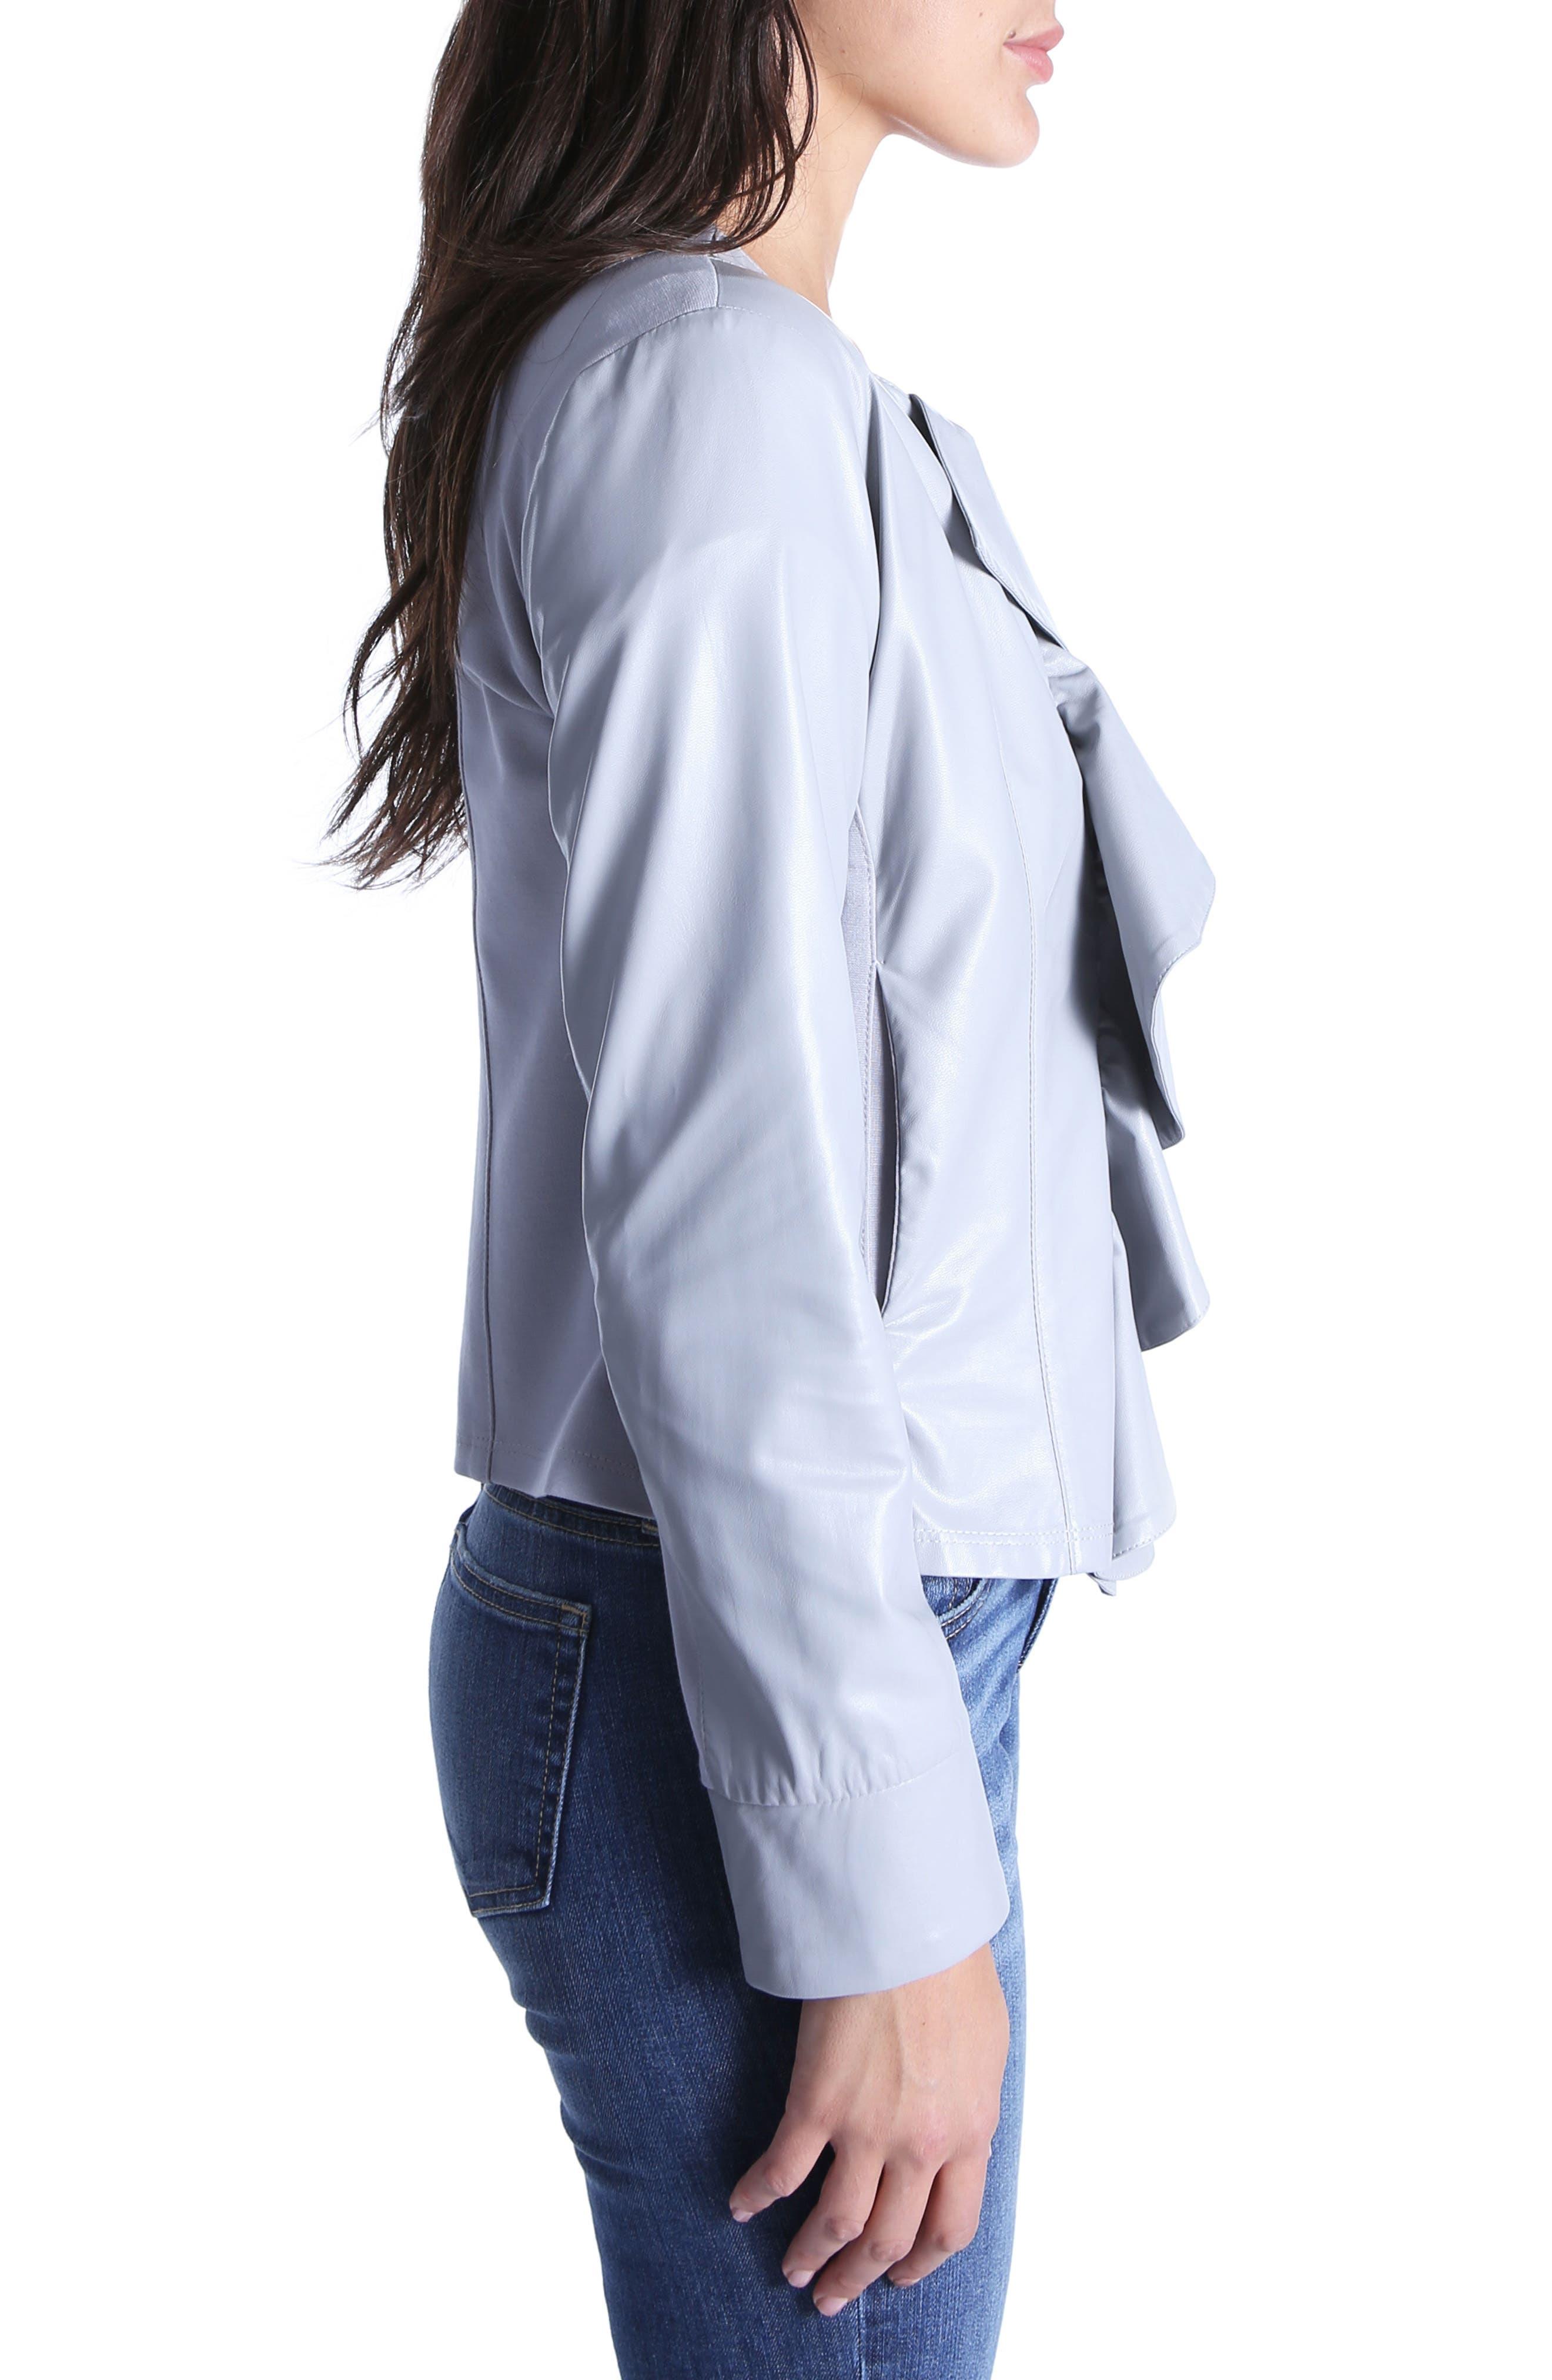 Dahliana Faux Leather Jacket,                             Alternate thumbnail 3, color,                             Grey